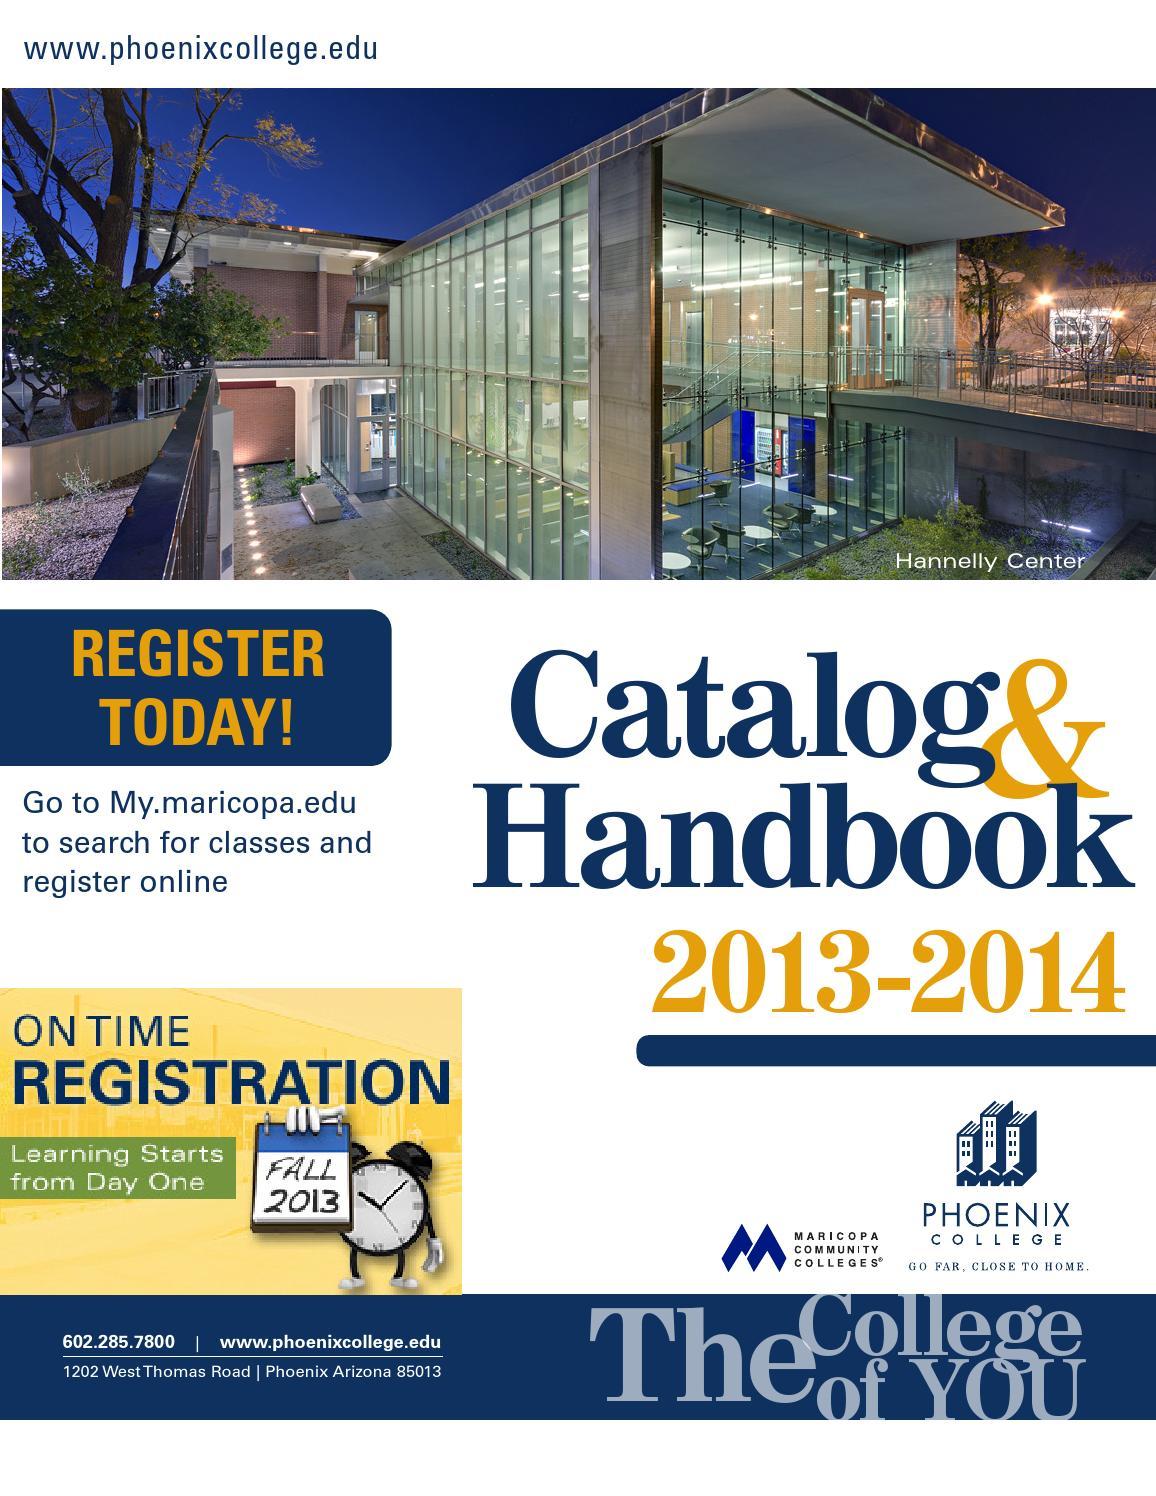 Phoenix College 2013-14 Catalog & Handbook